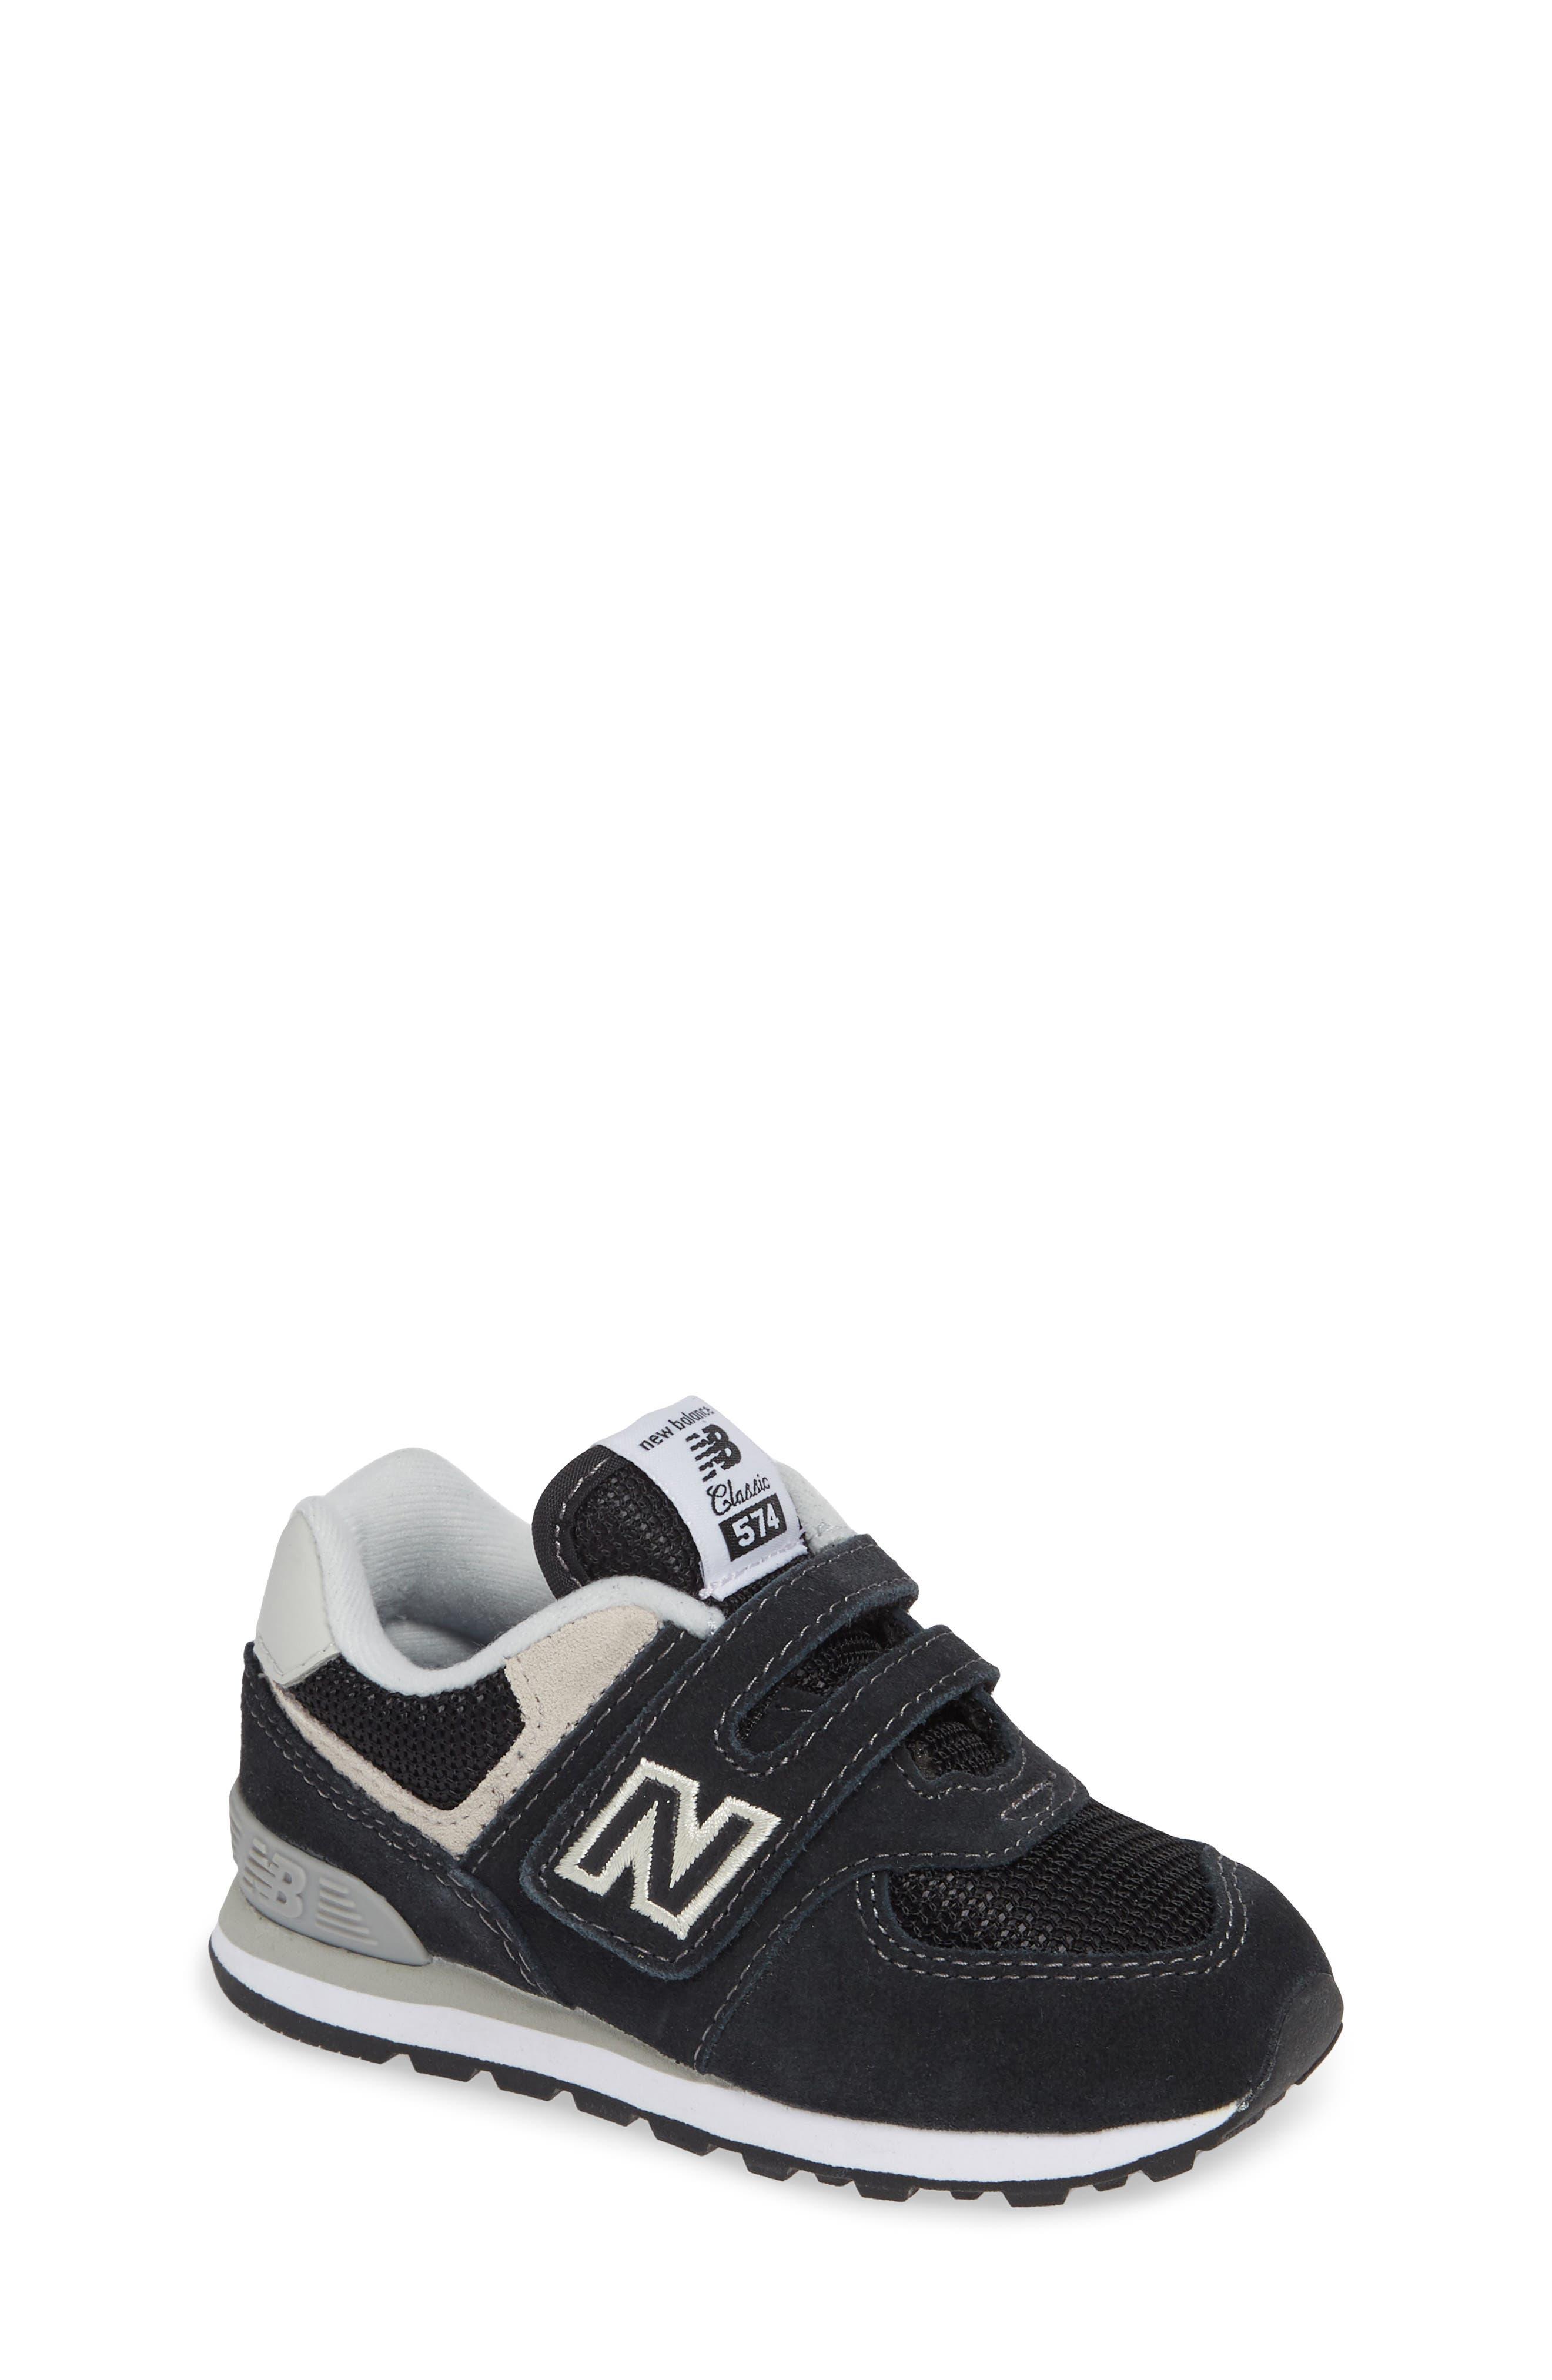 '574 Core' Sneaker,                         Main,                         color, BLACK/ GREY